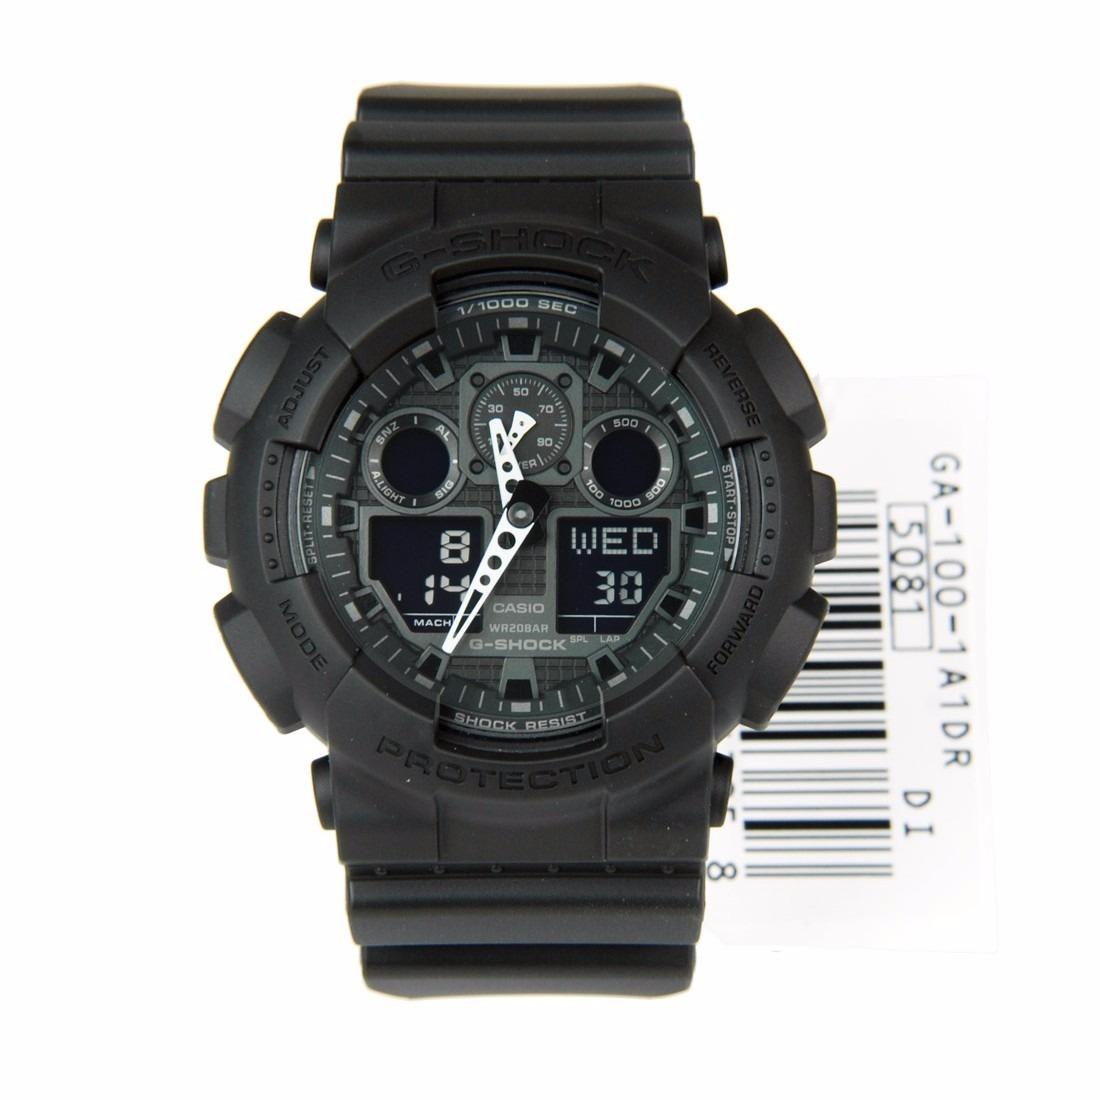 53d8b901128 relógio casio g-shock ga 100 wr200 h.mundial 5 alarmes pt. Carregando zoom.